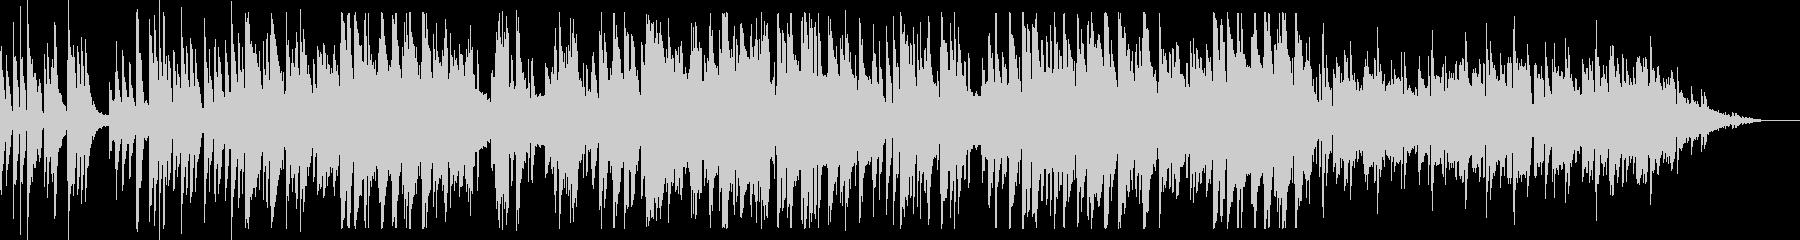 Jazz Soul's unreproduced waveform